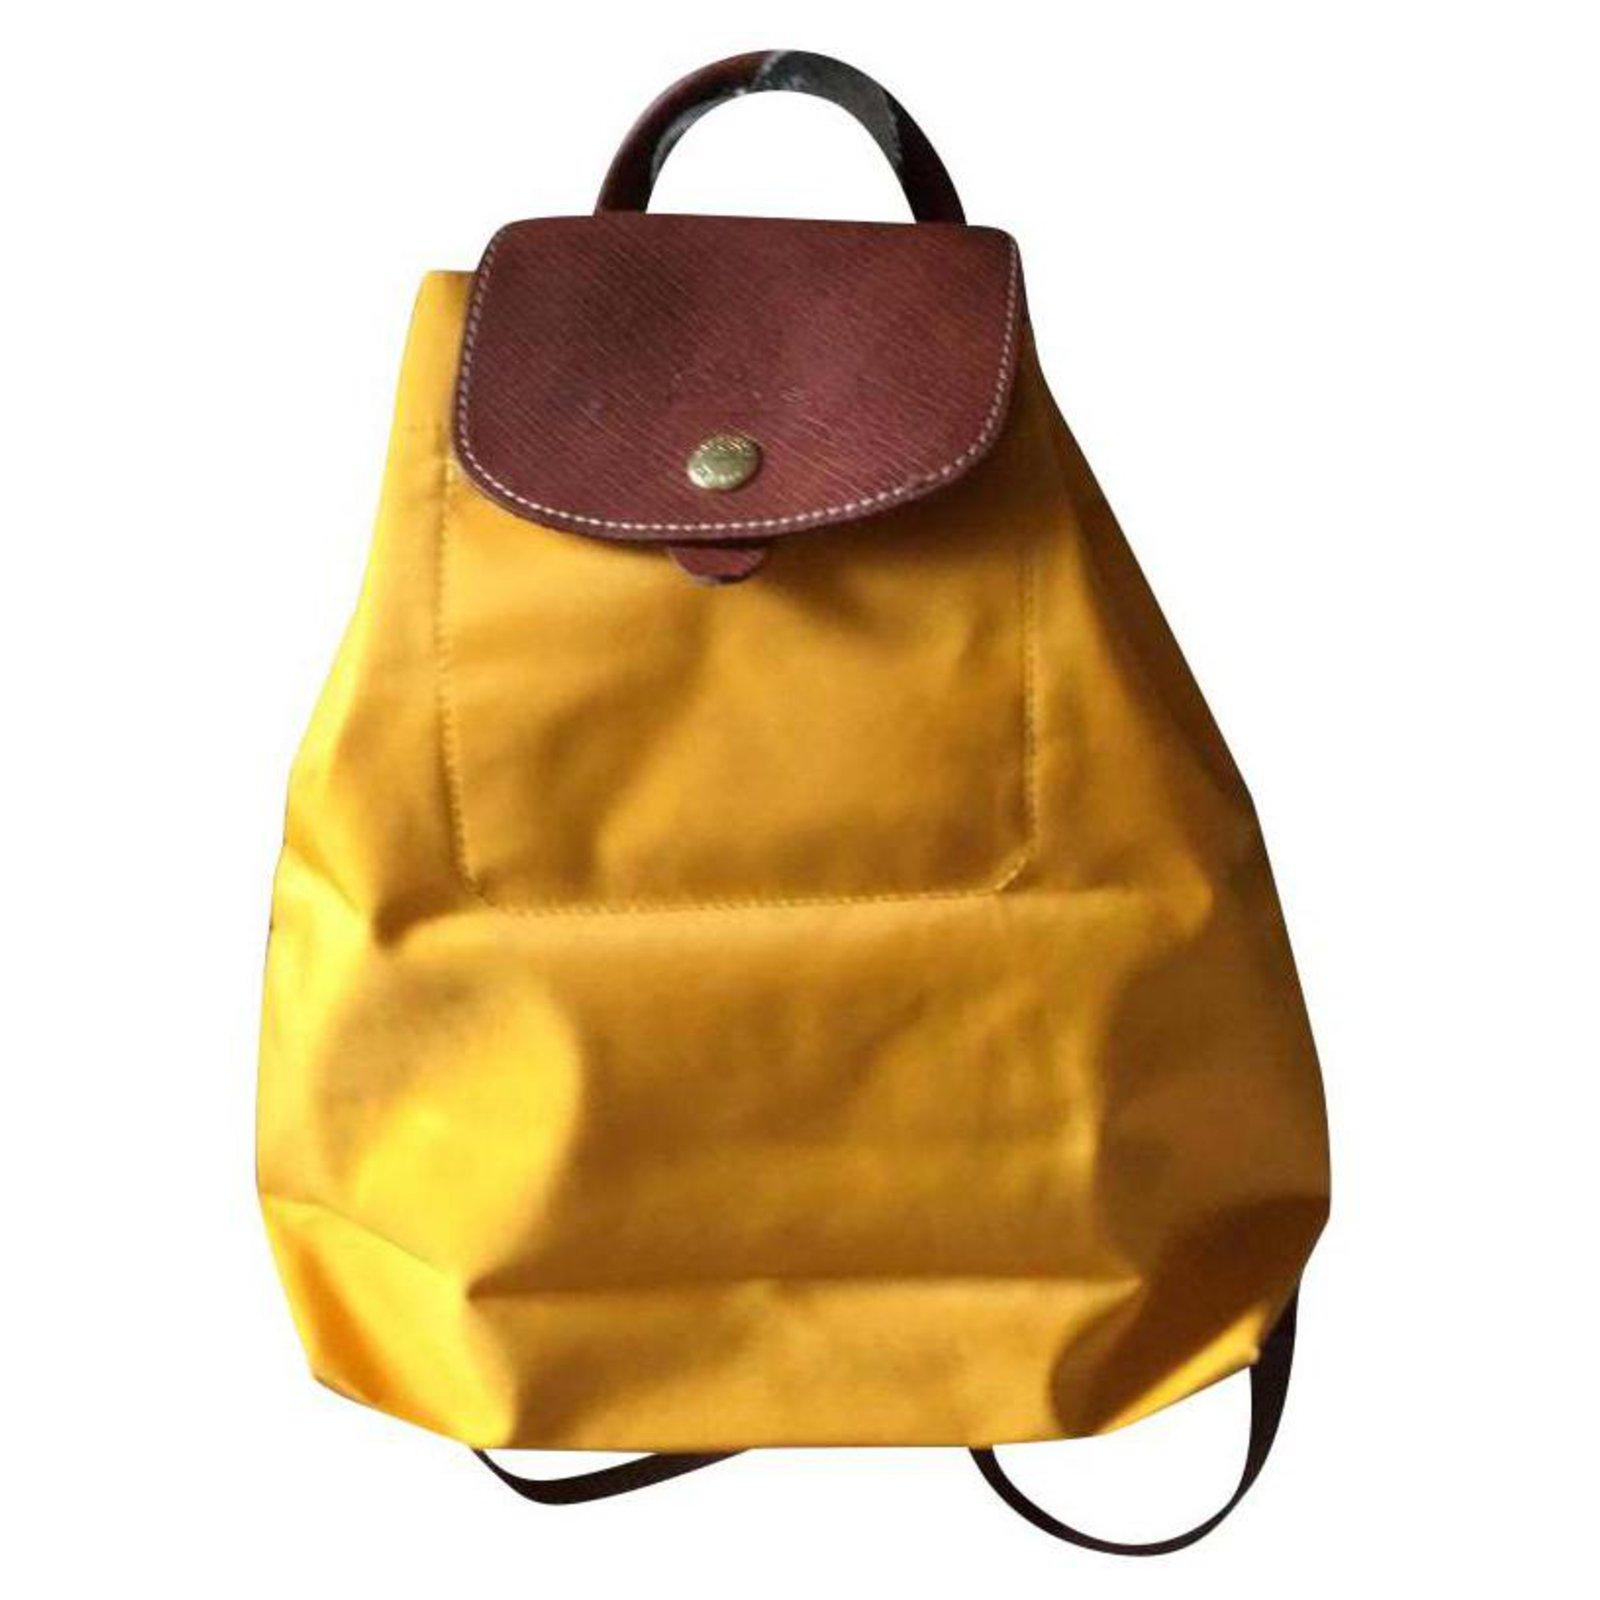 Folding backpack size S